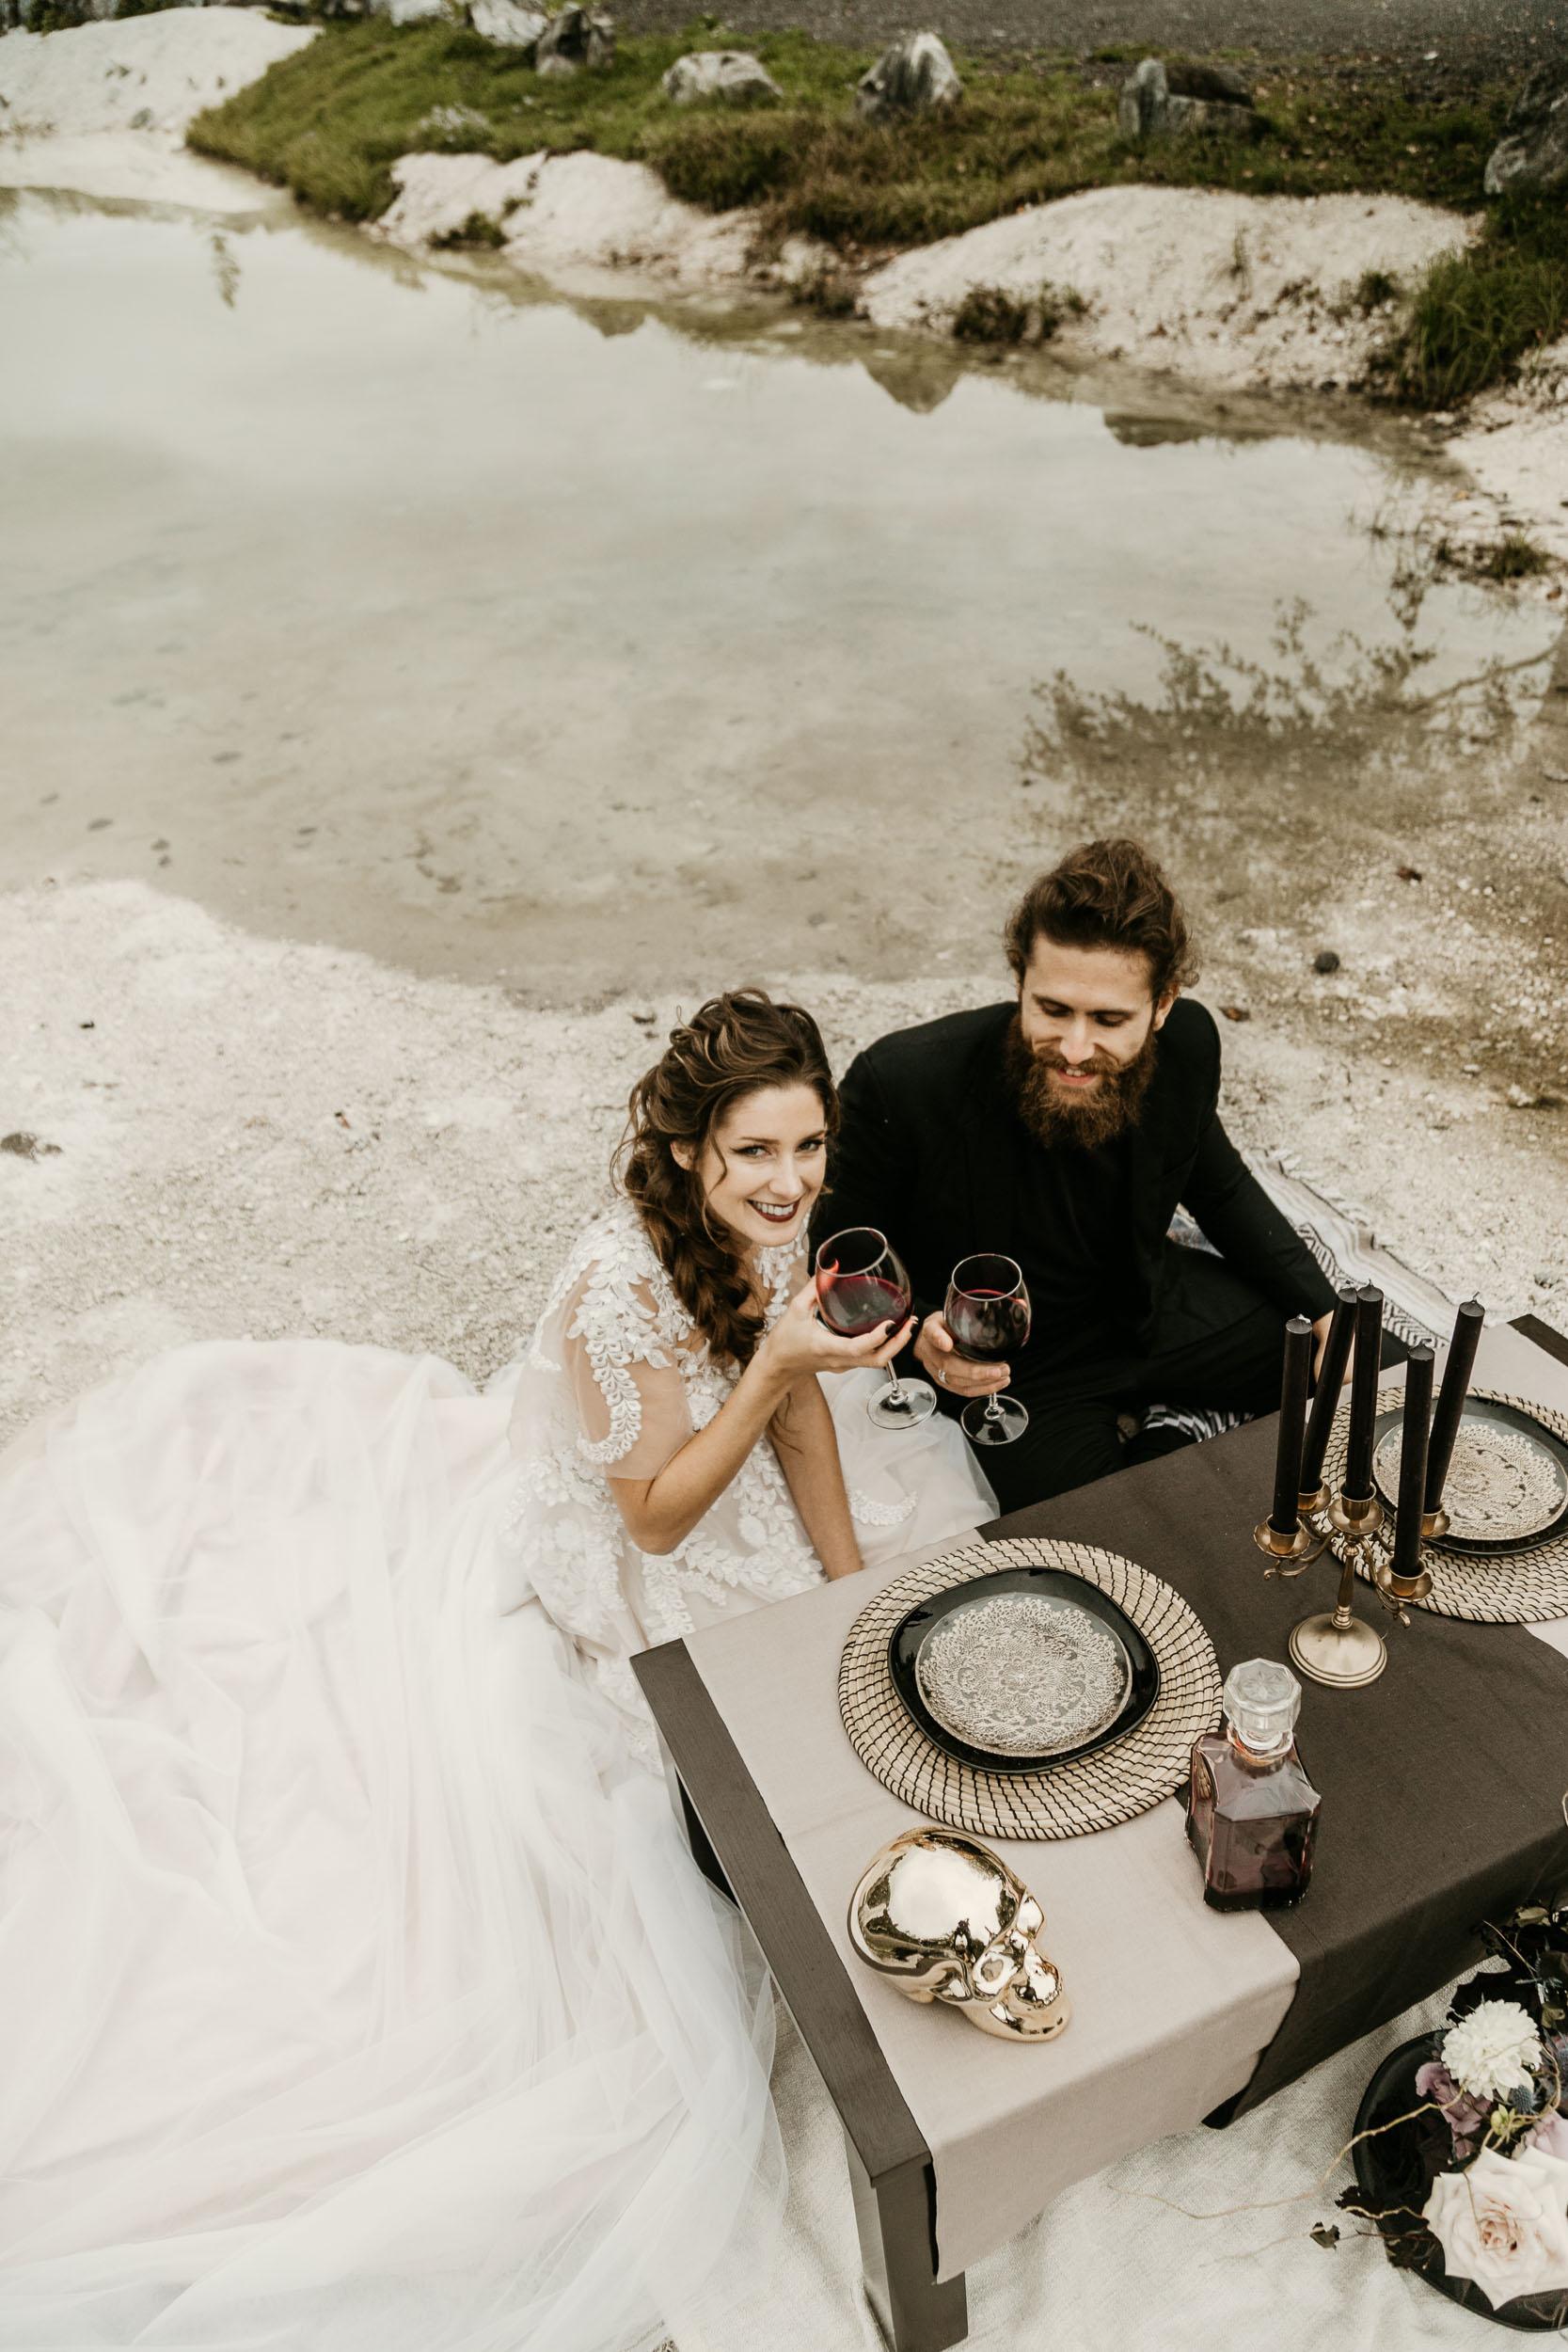 intimate-wedding-elopement-photographer-ottawa-toronto-0735.jpg